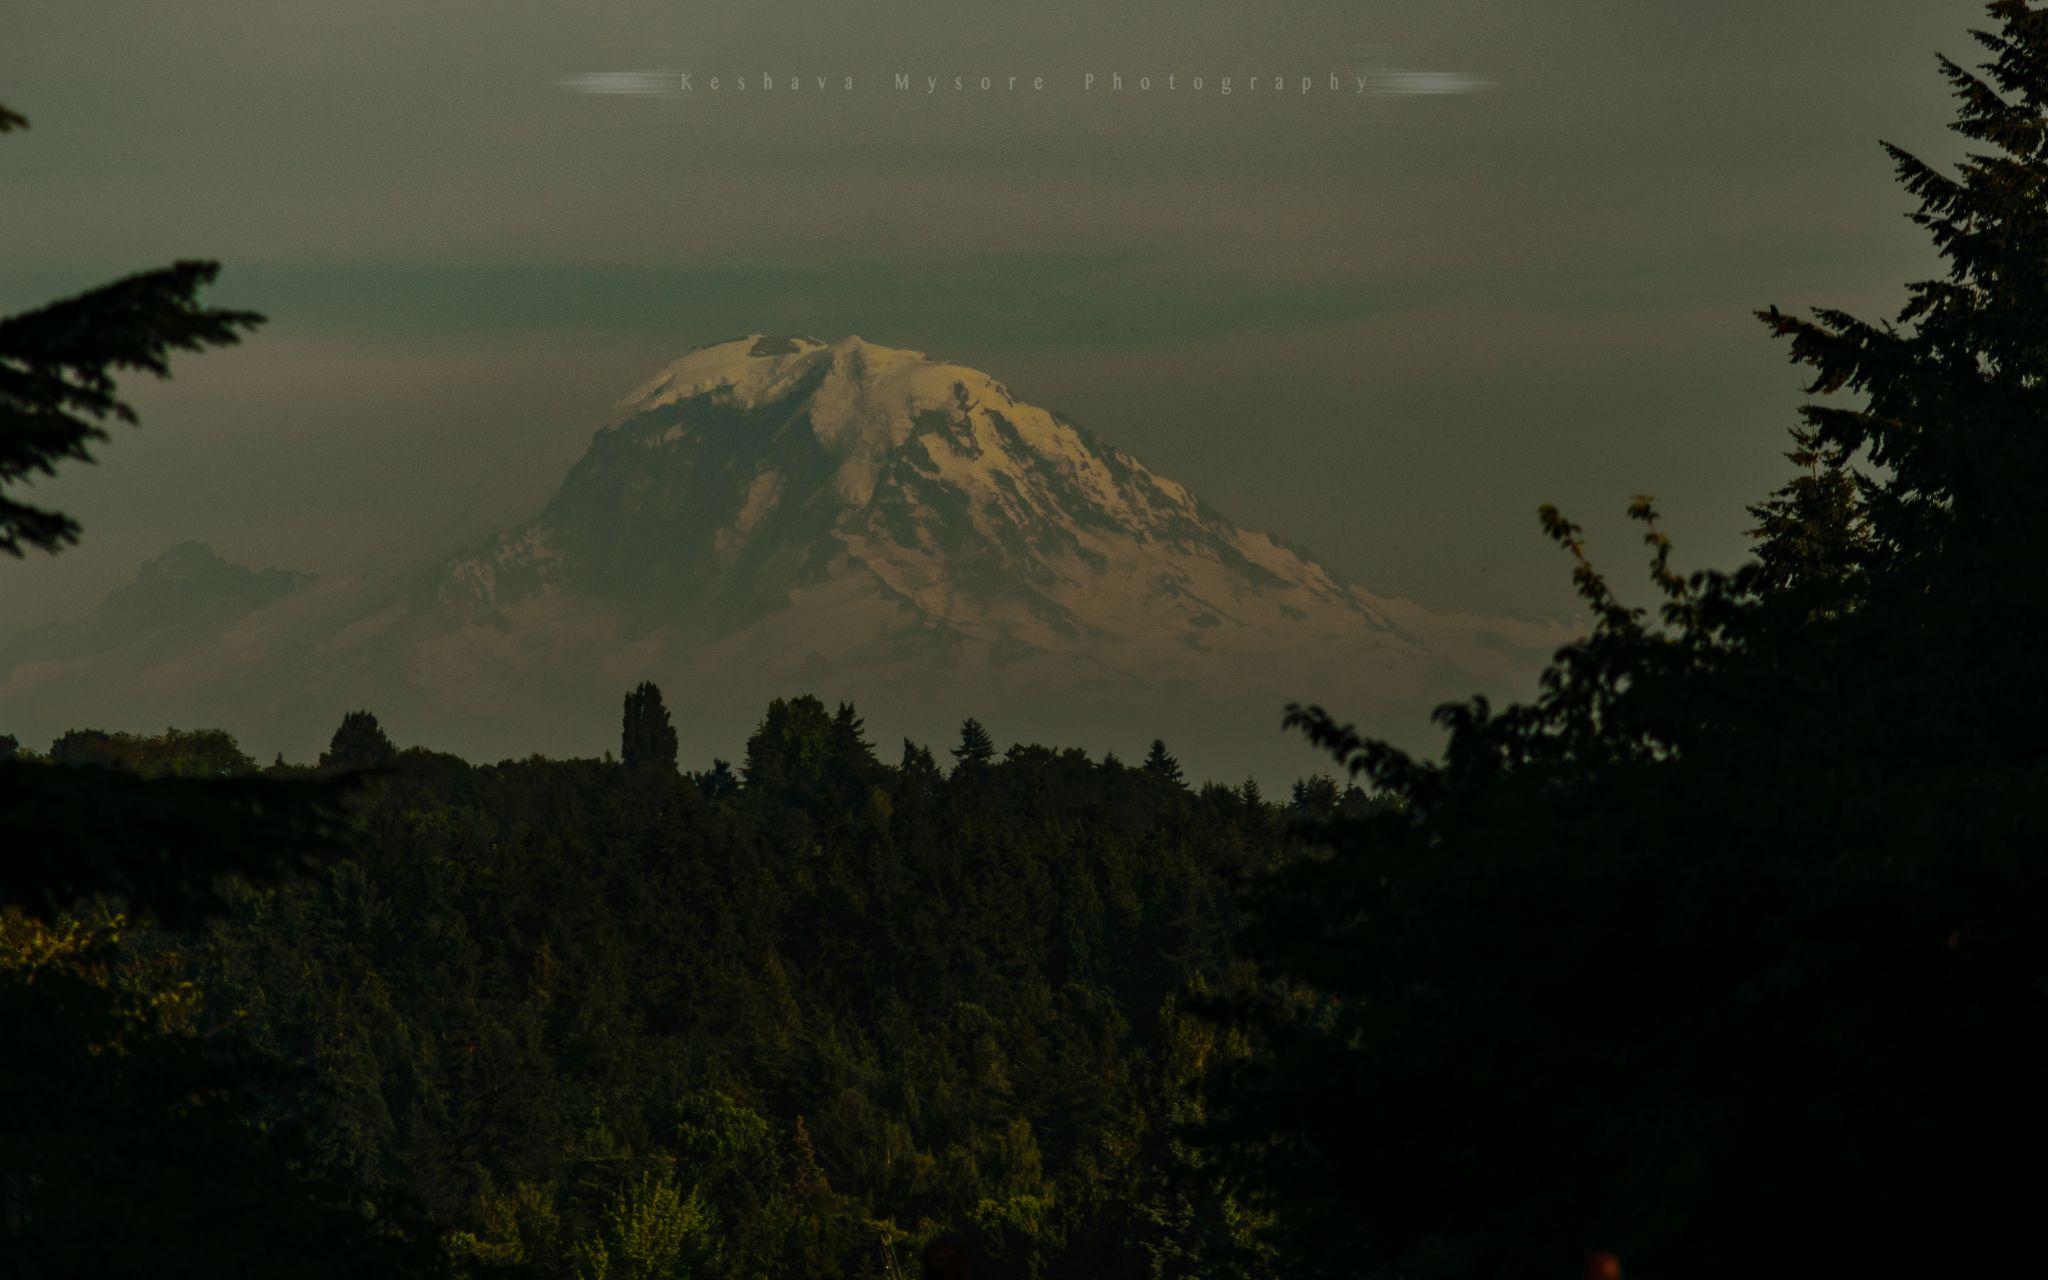 Rainier vista from Uni. of Washington, Seattle, USA